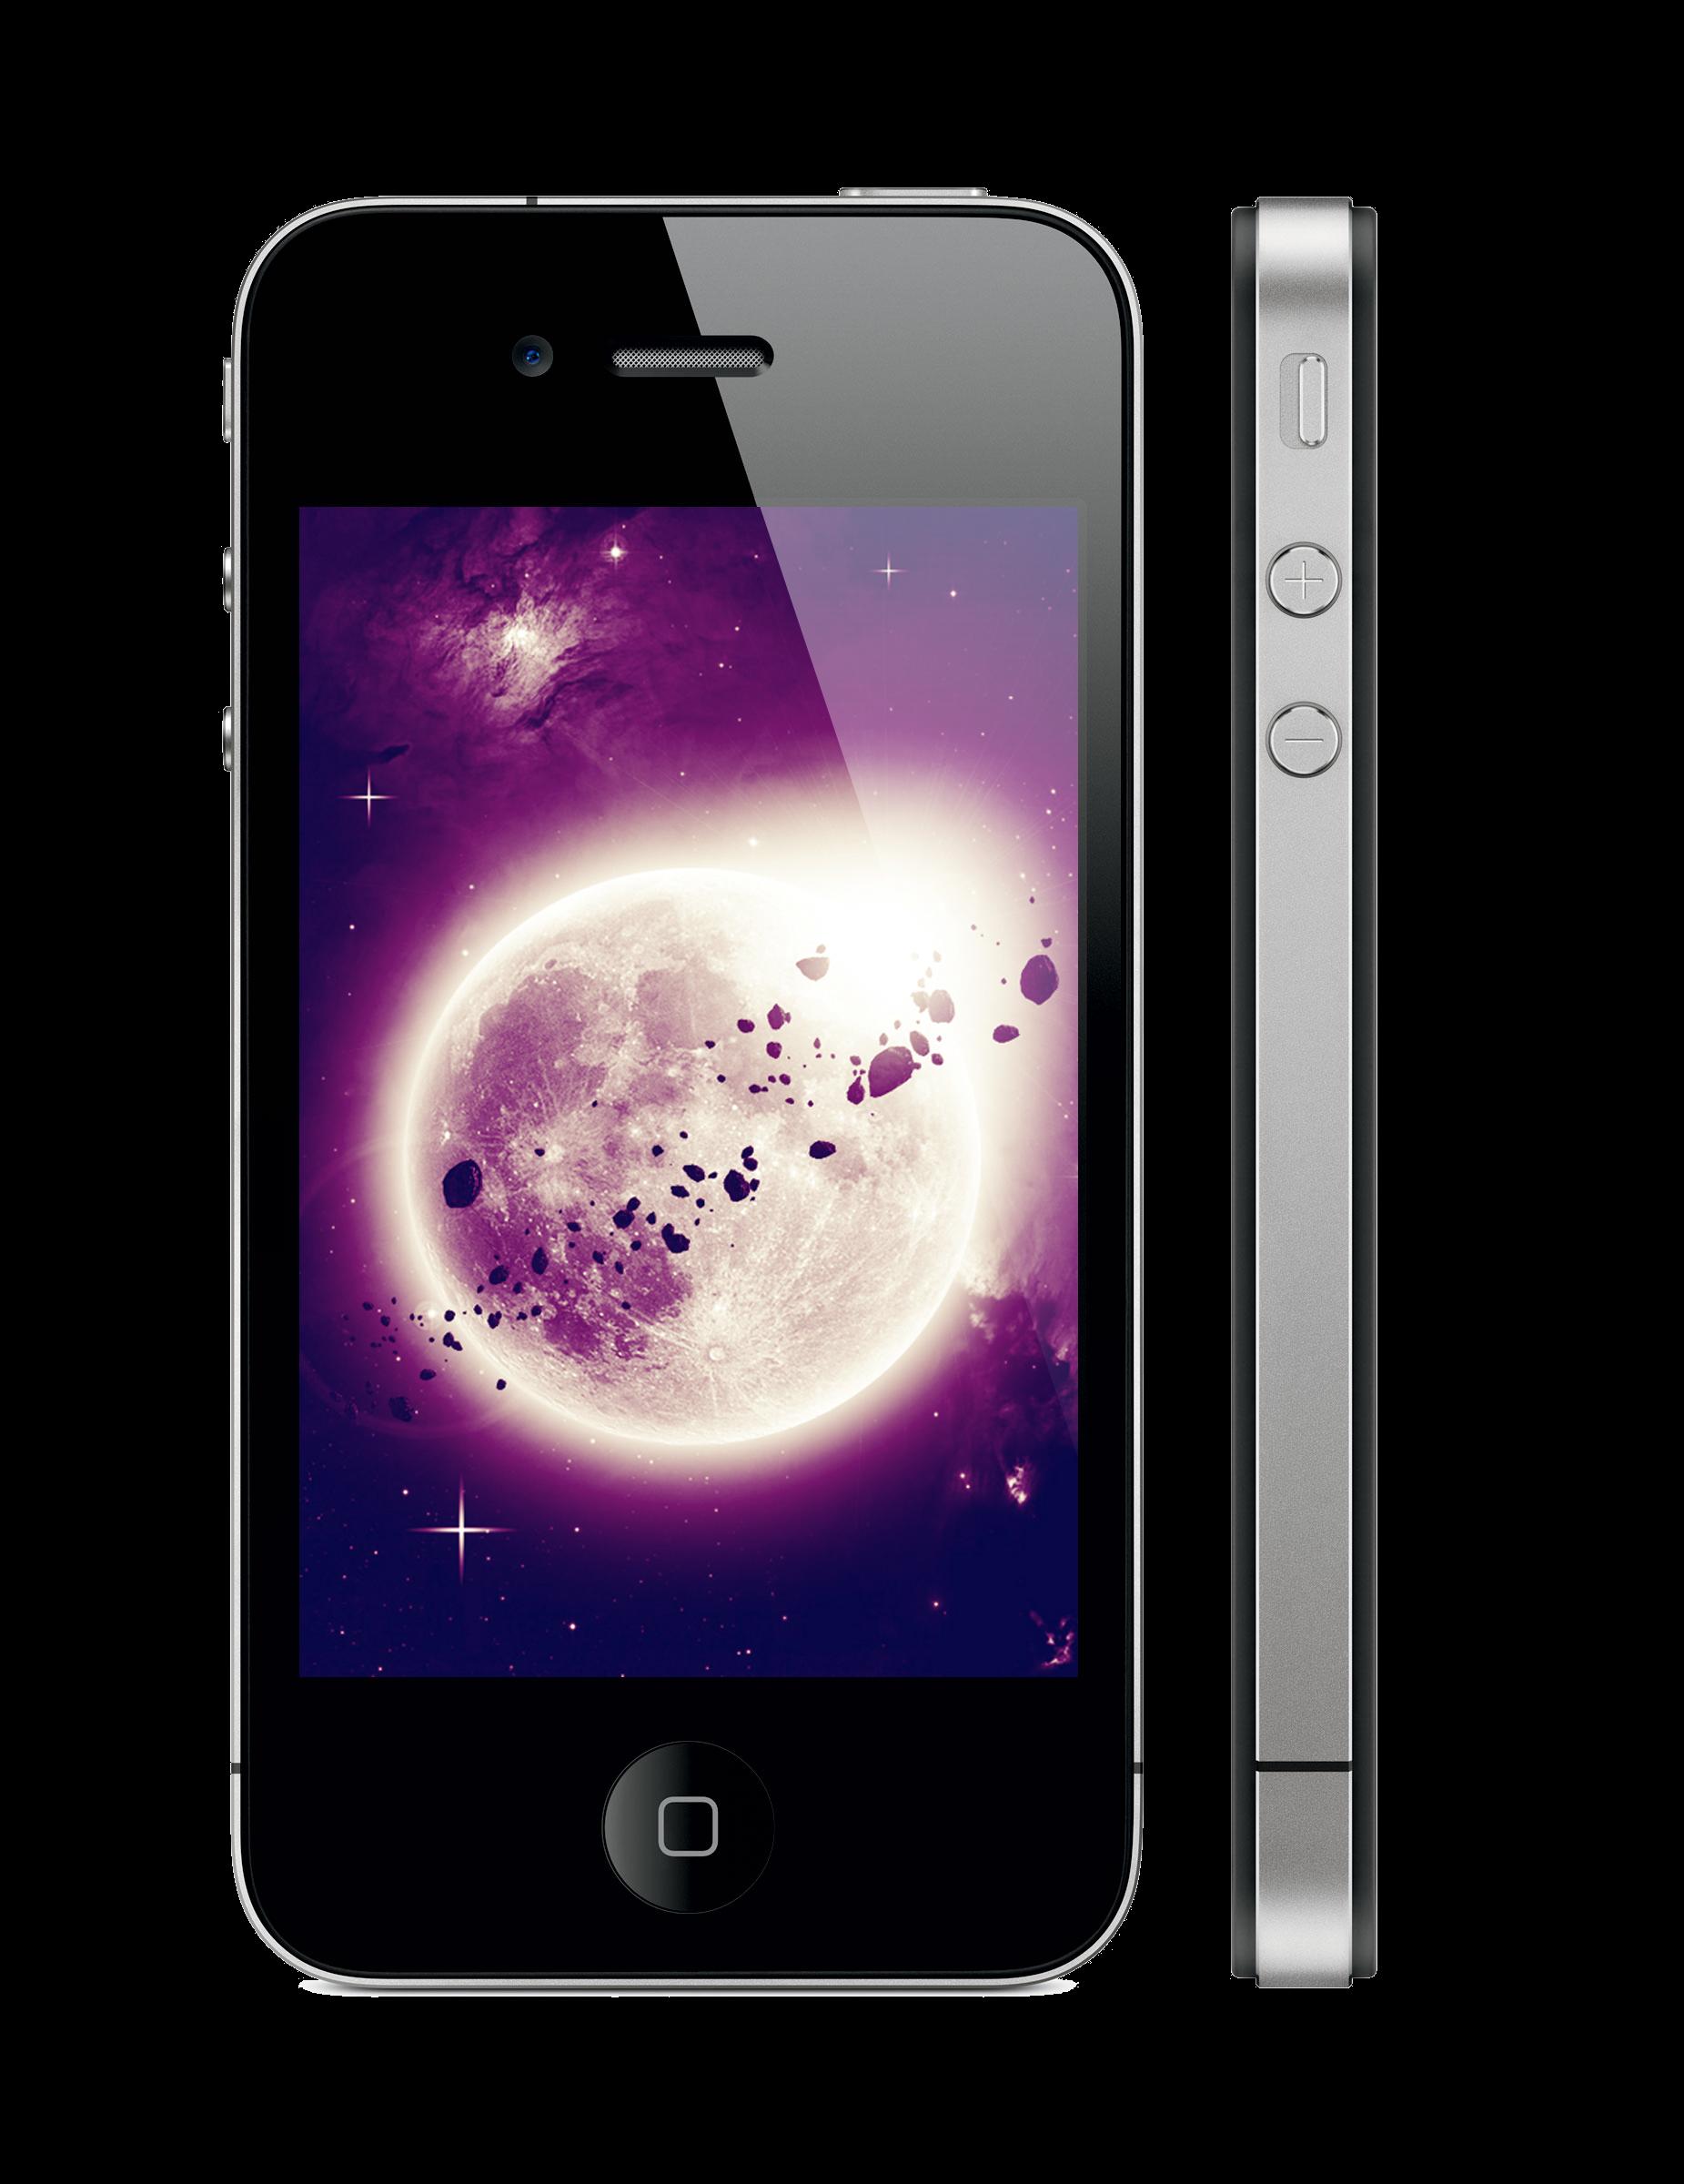 [44+] iPhone Wallpaper Size Pixel on WallpaperSafari